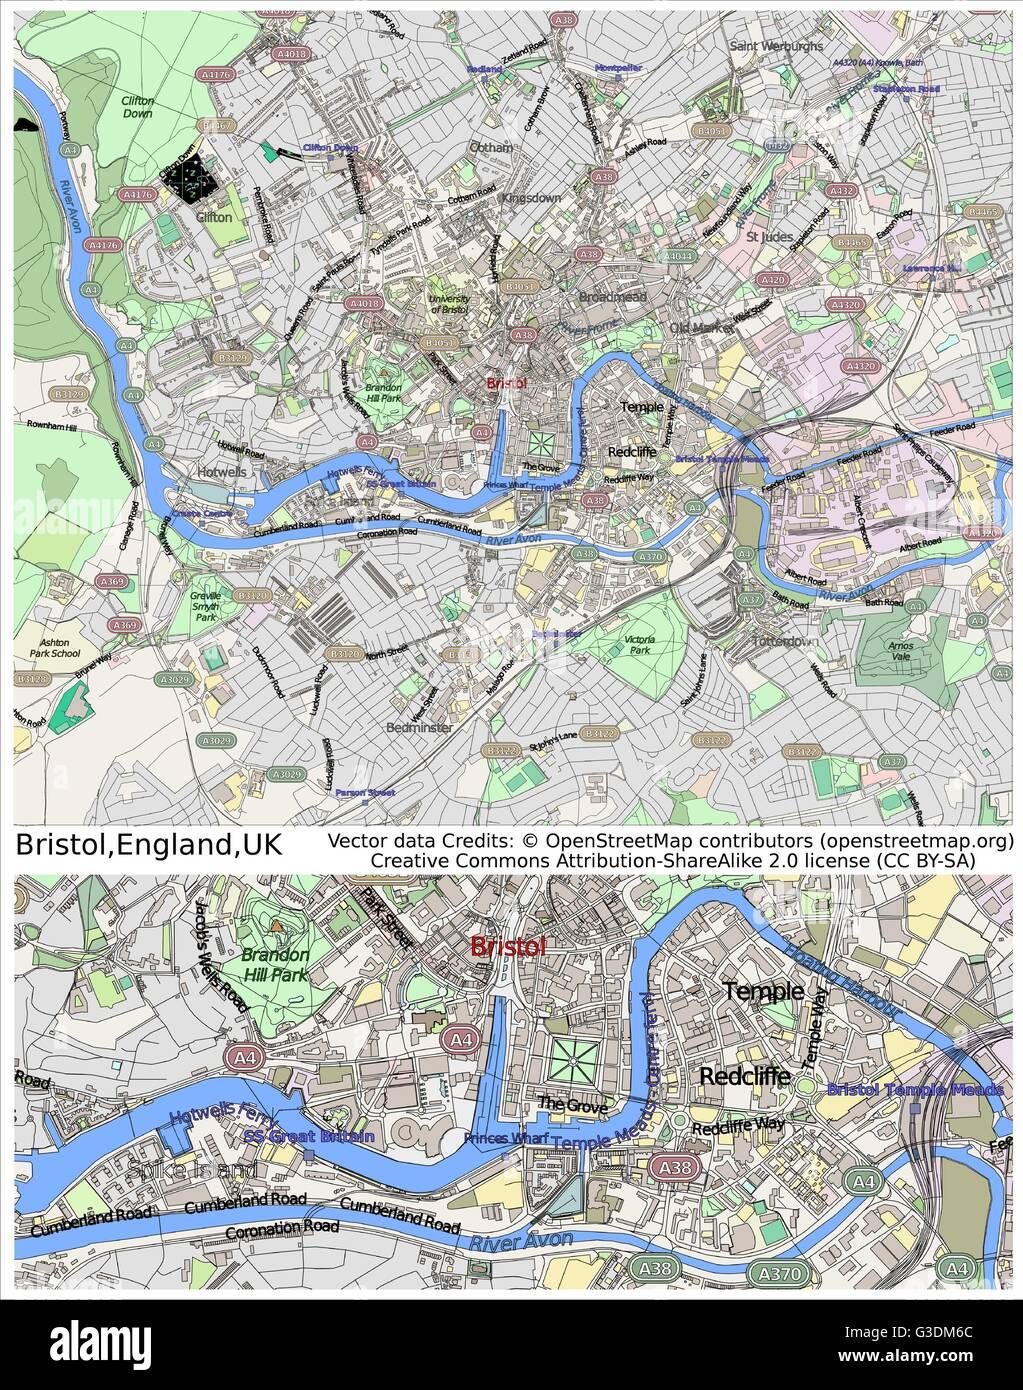 Map Of Bristol Uk.Bristol England Uk City Map Stock Vector Art Illustration Vector